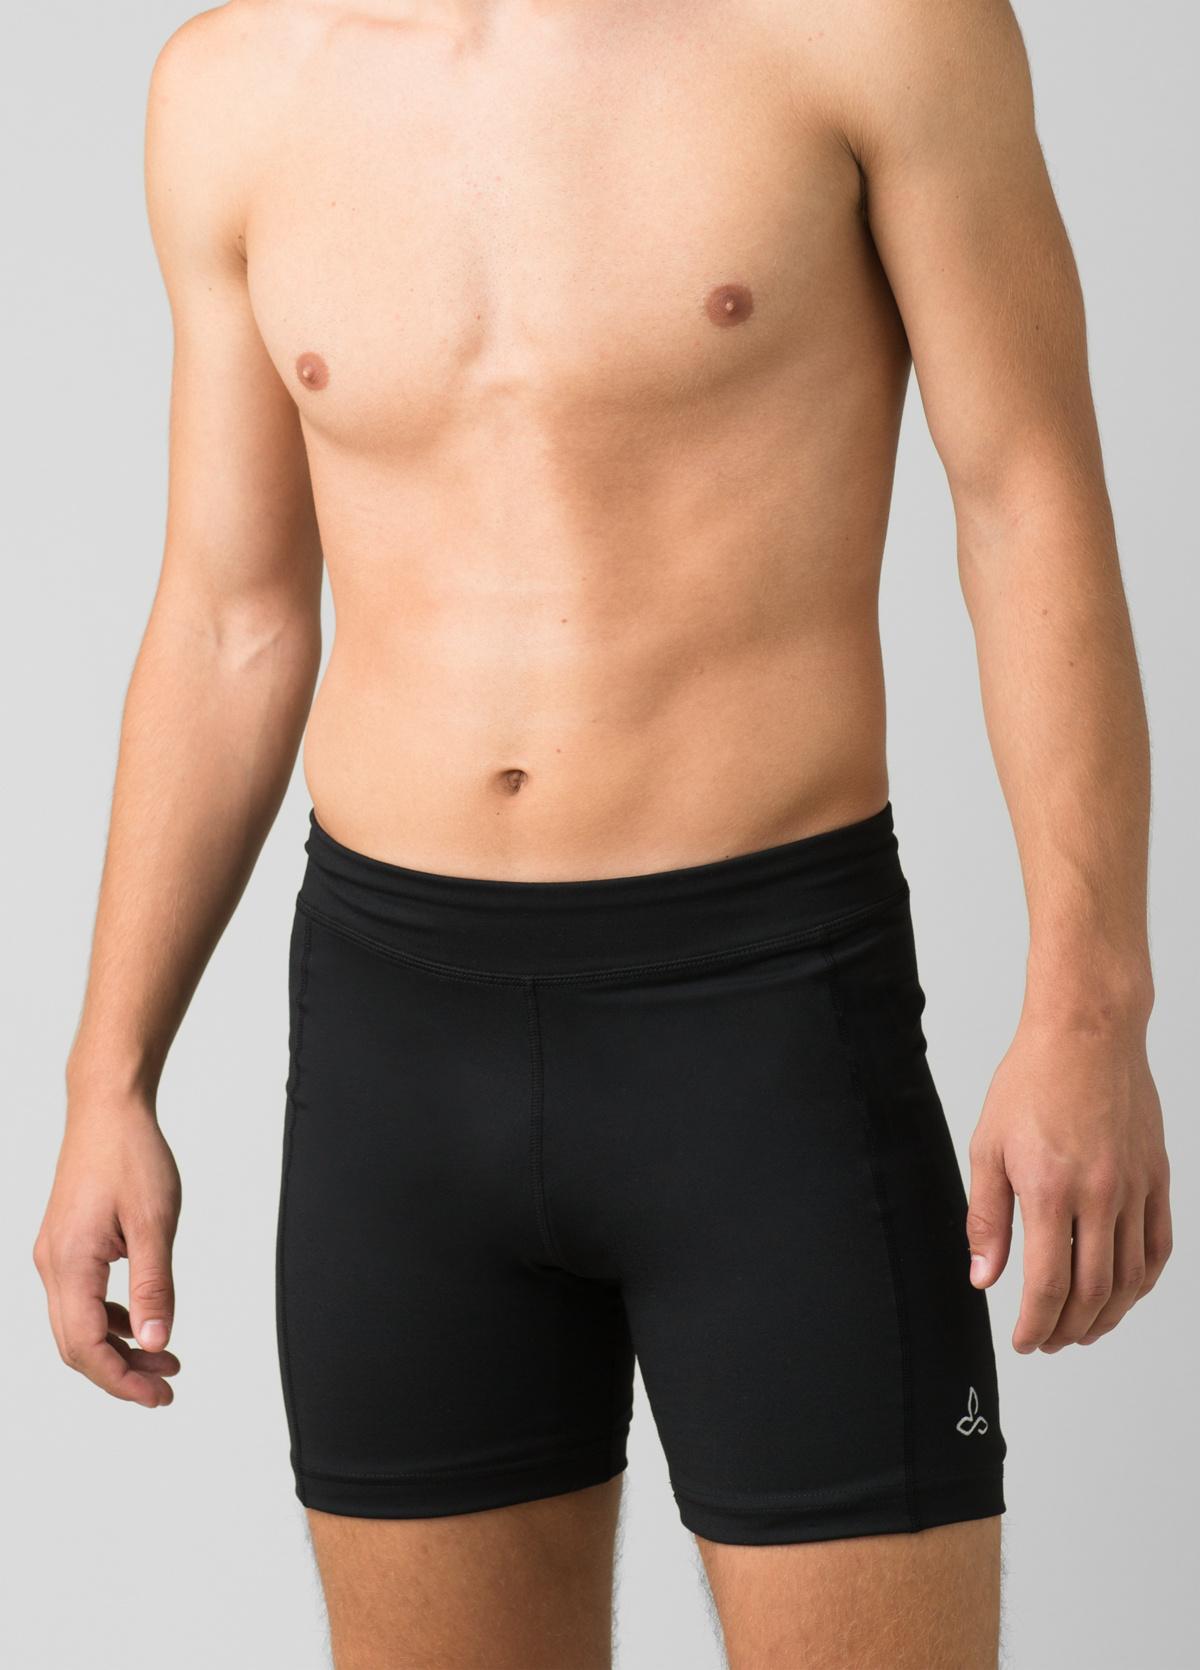 Prana JD Knicker Men/'s Intense Yoga Practice Exercise Performance Stretch Fabric